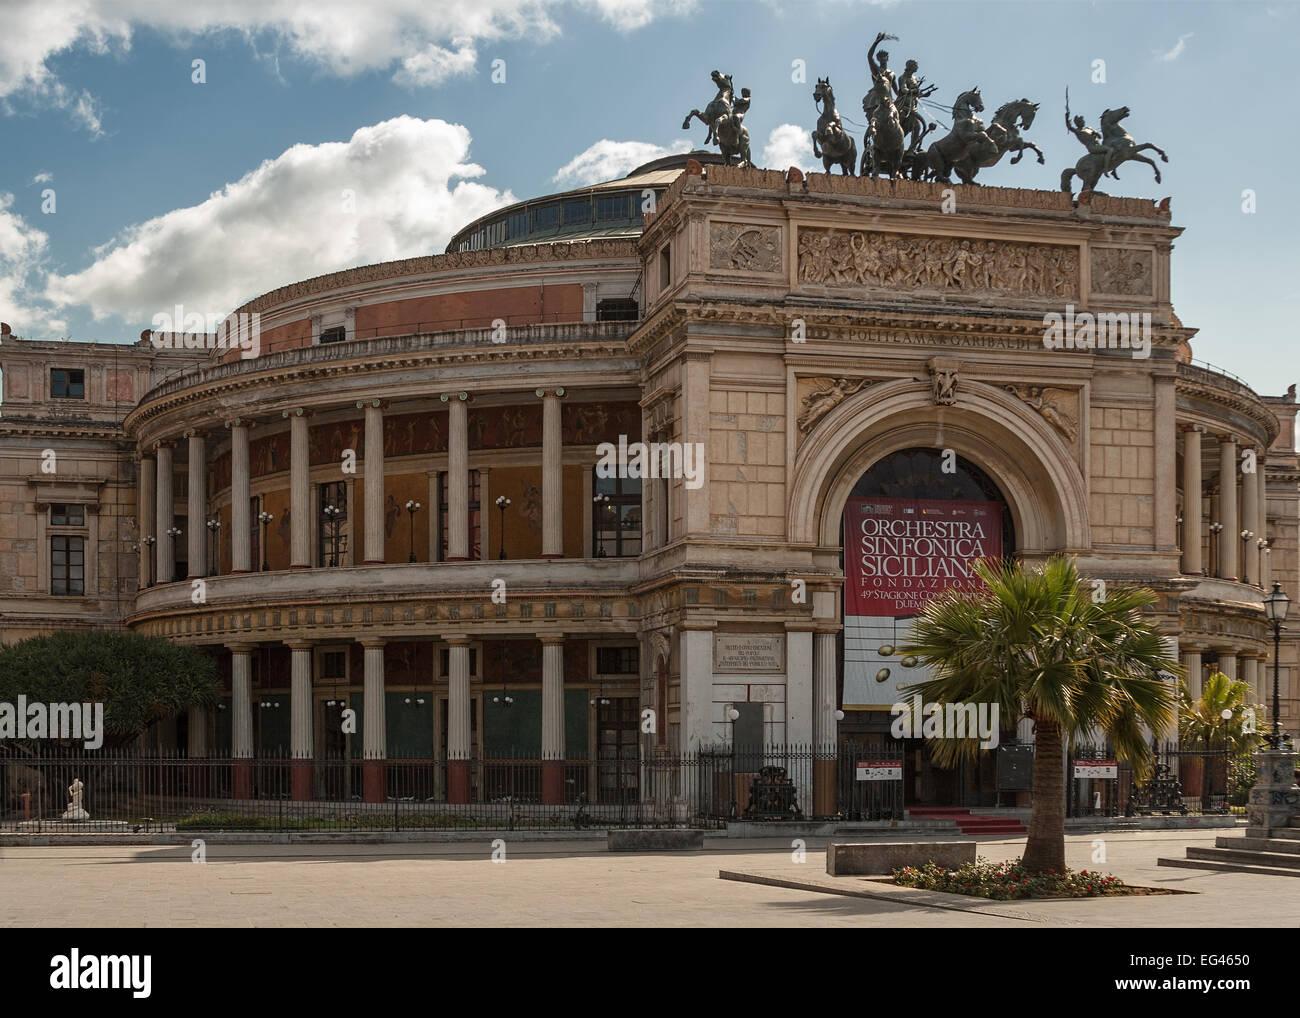 The Politeama Garibaldi theater in Palermo. Sicily. Italy Stock Photo